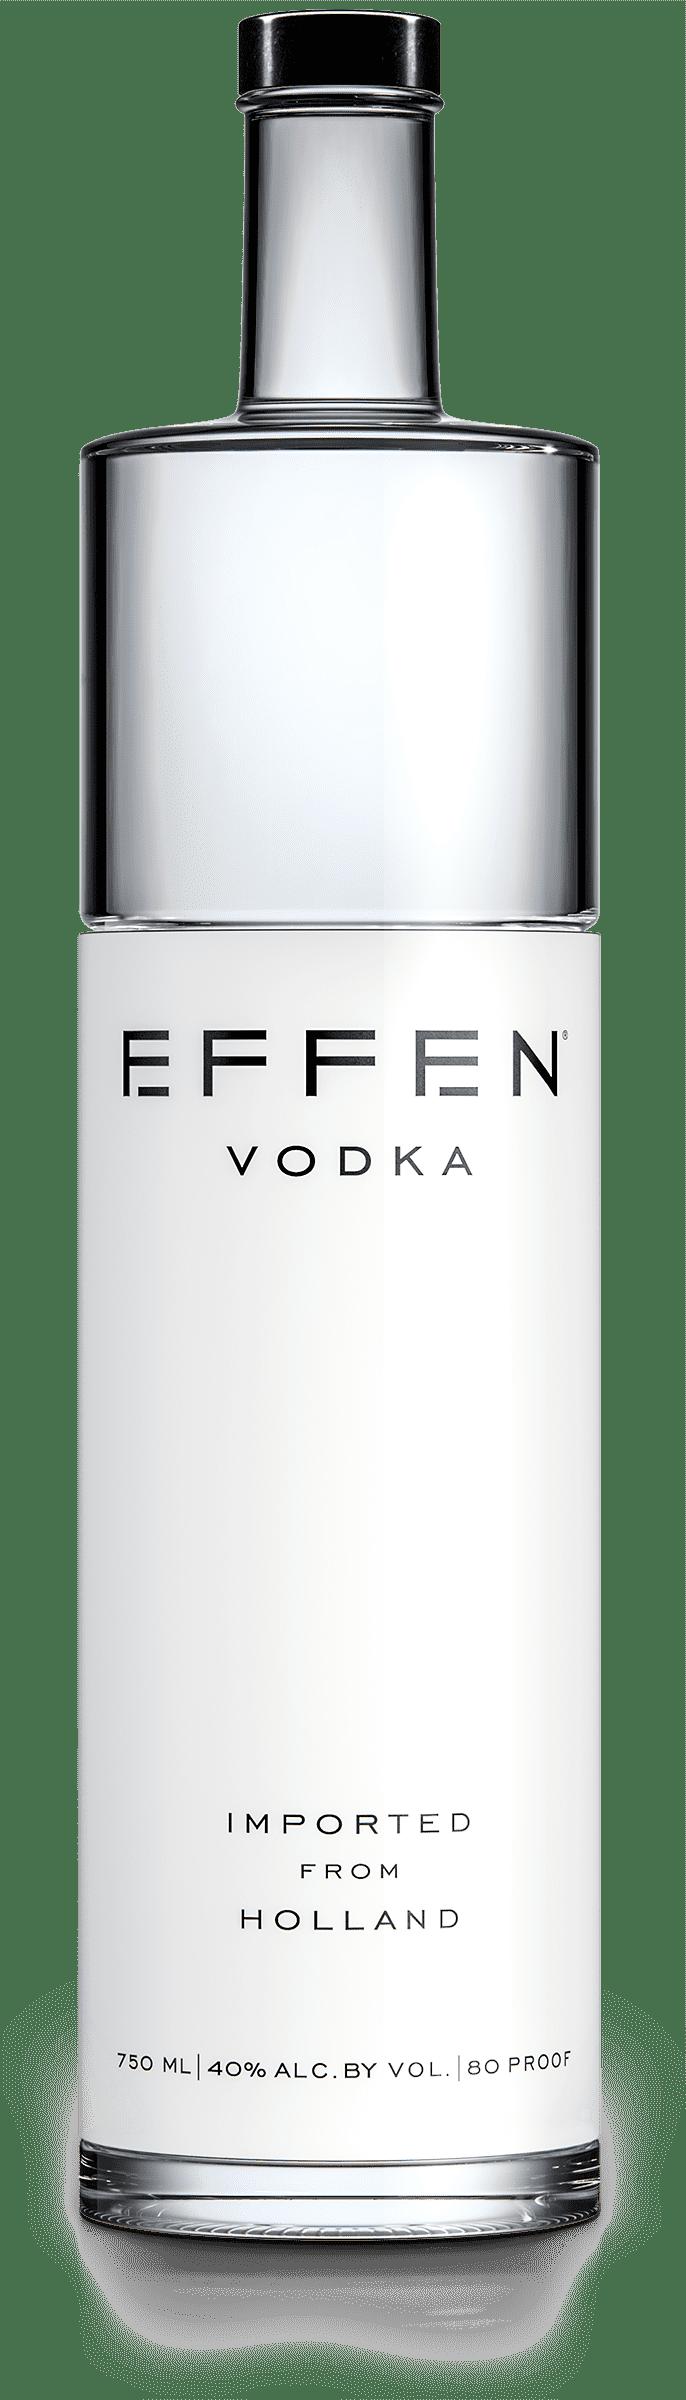 EFFEN Premium Vodka bottle shot